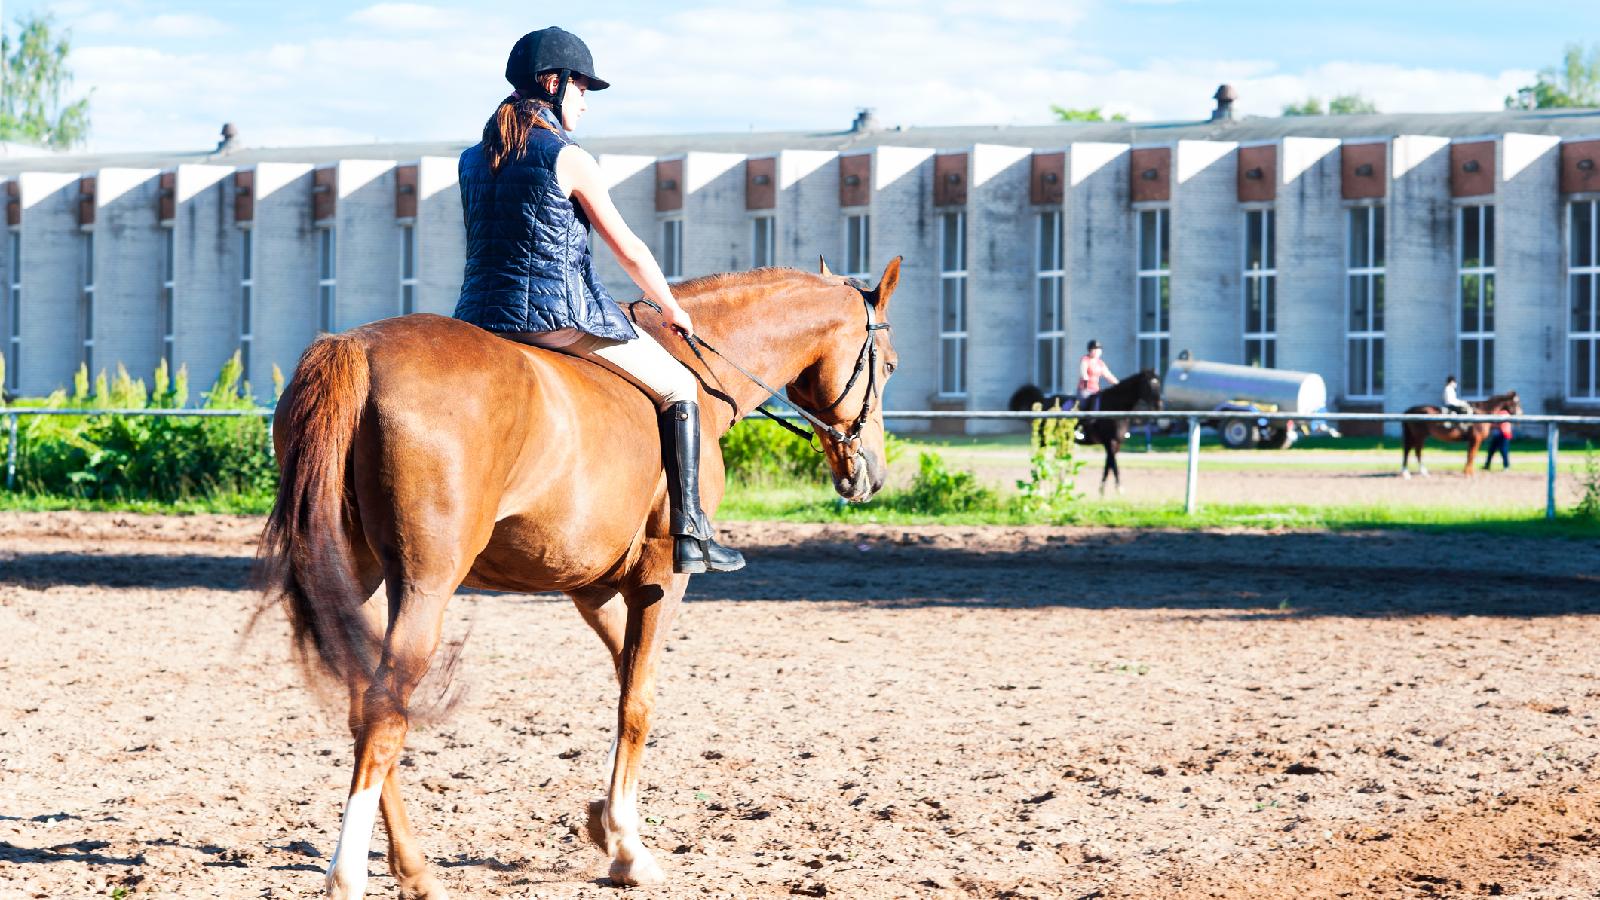 Pferd beißt Angreifer in den Arm